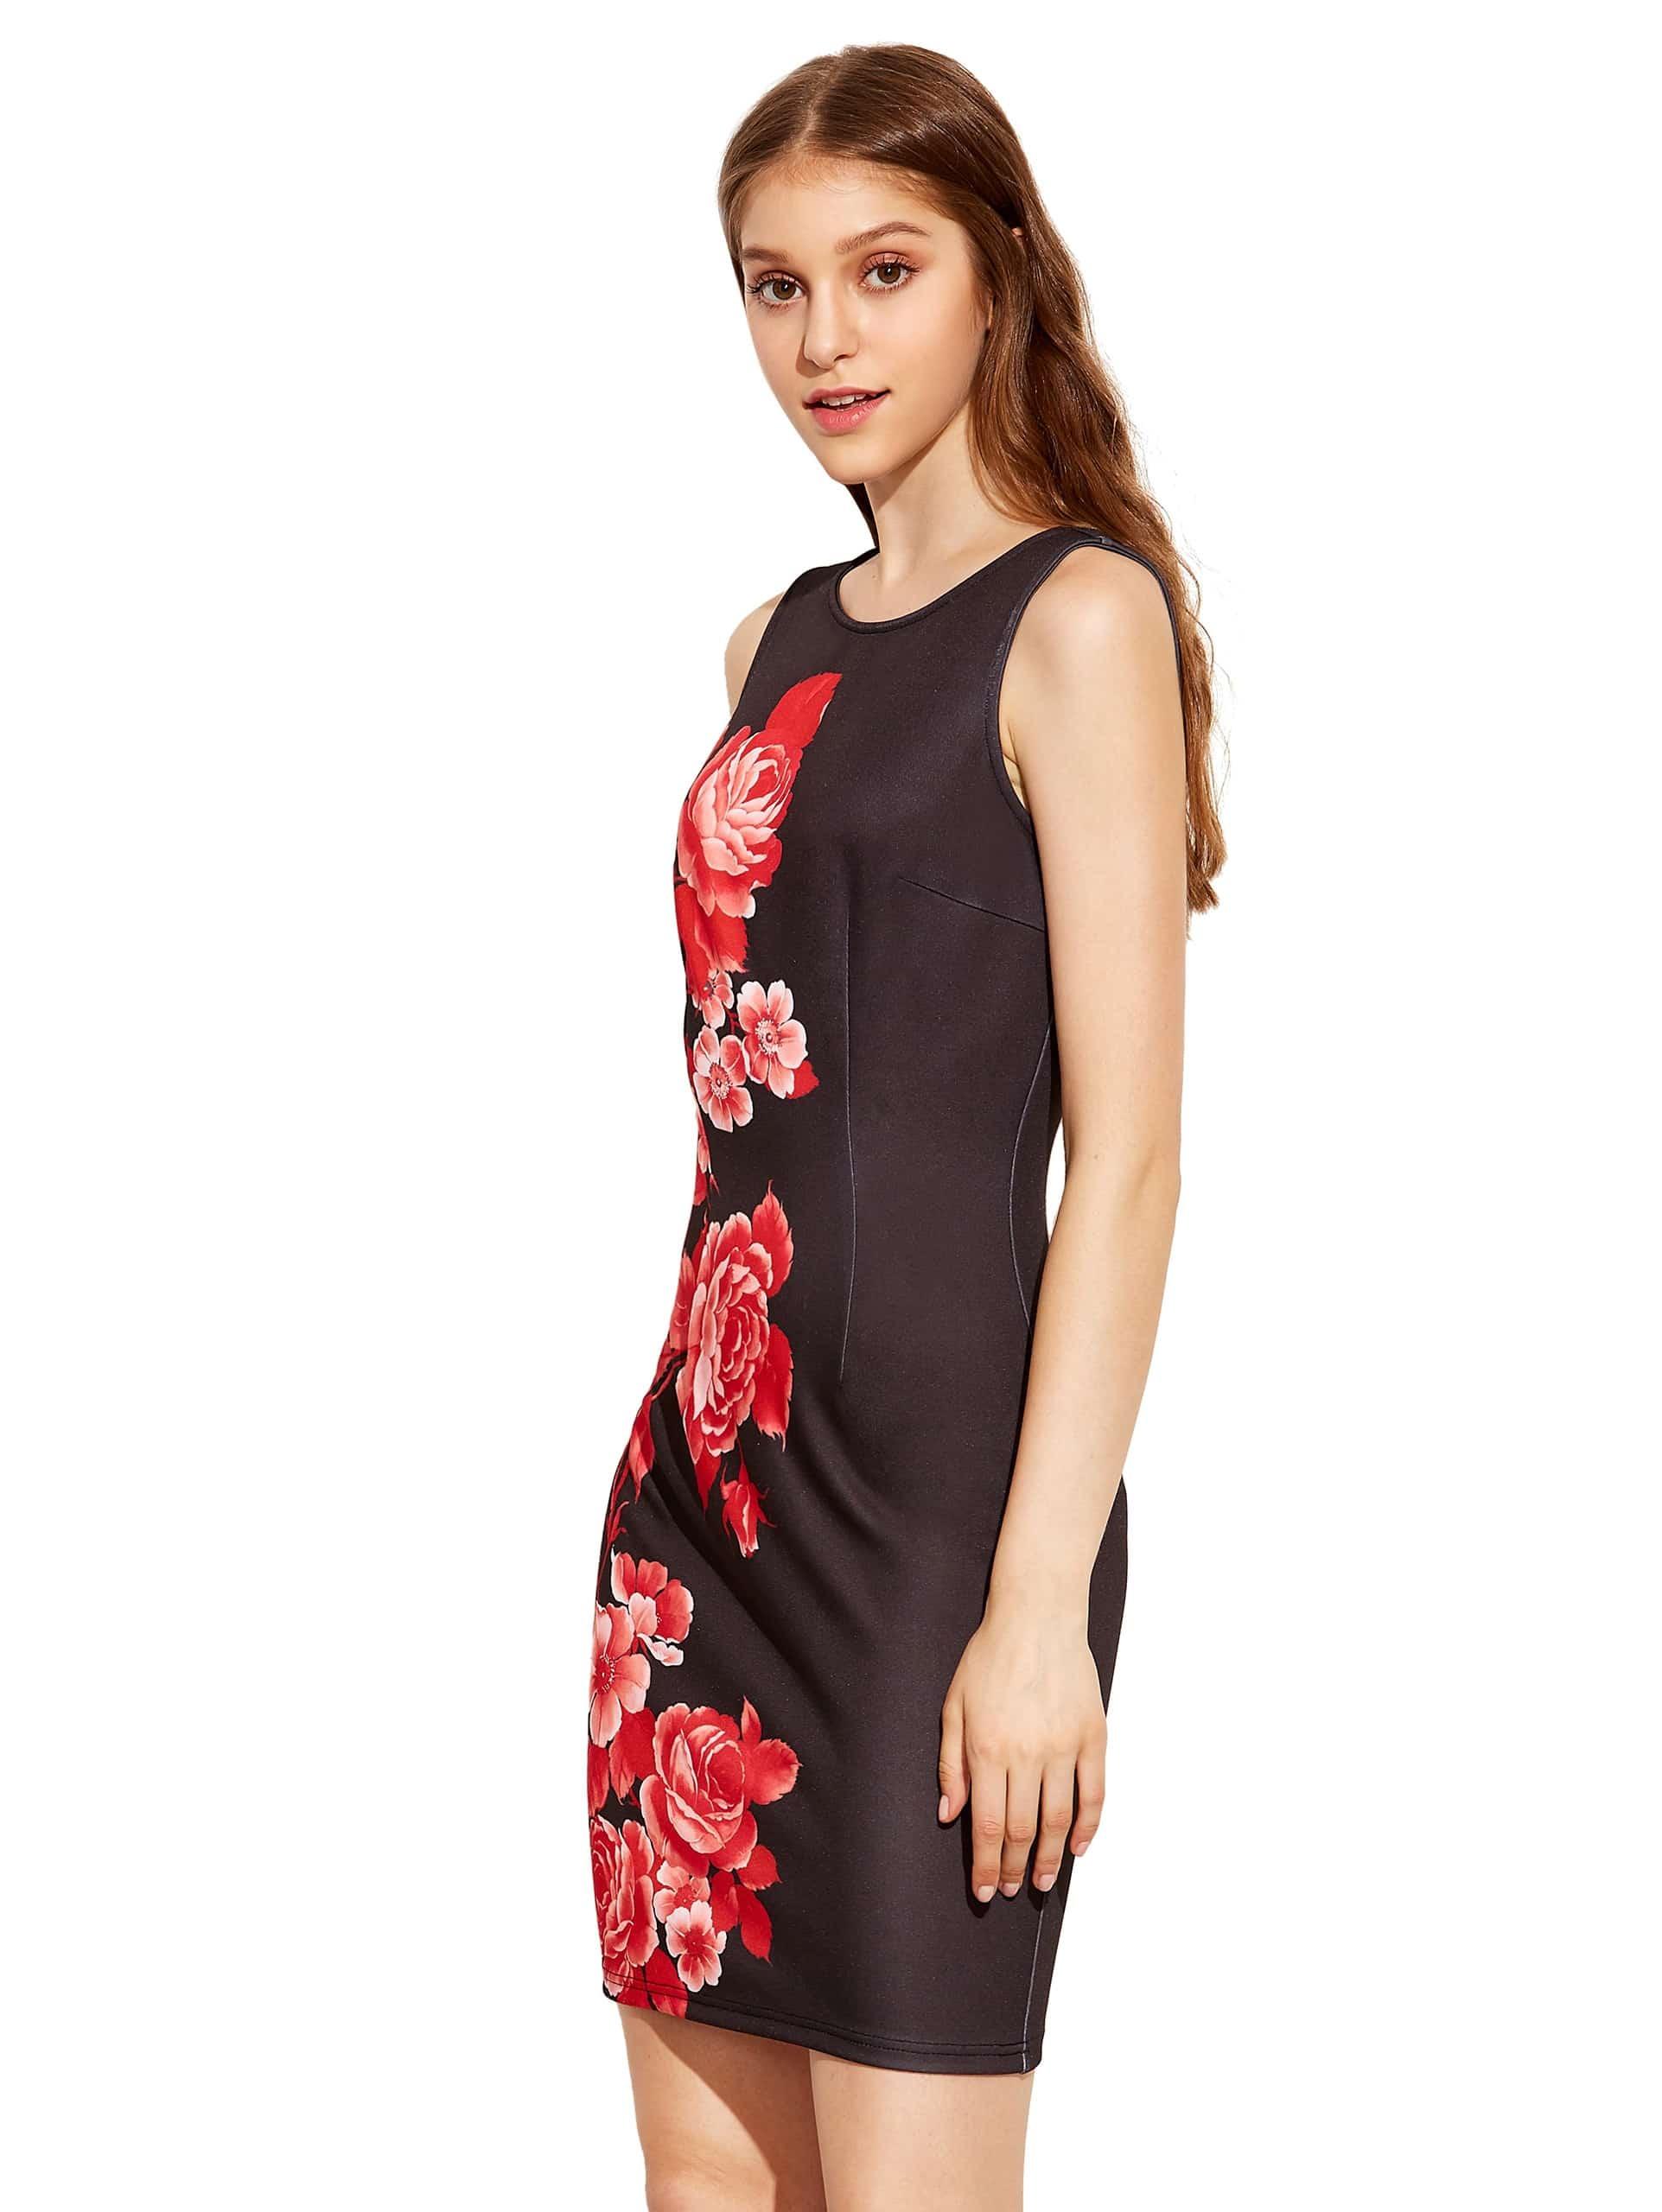 Black Sleeveless Vintage Print Dress -SheIn(Sheinside)